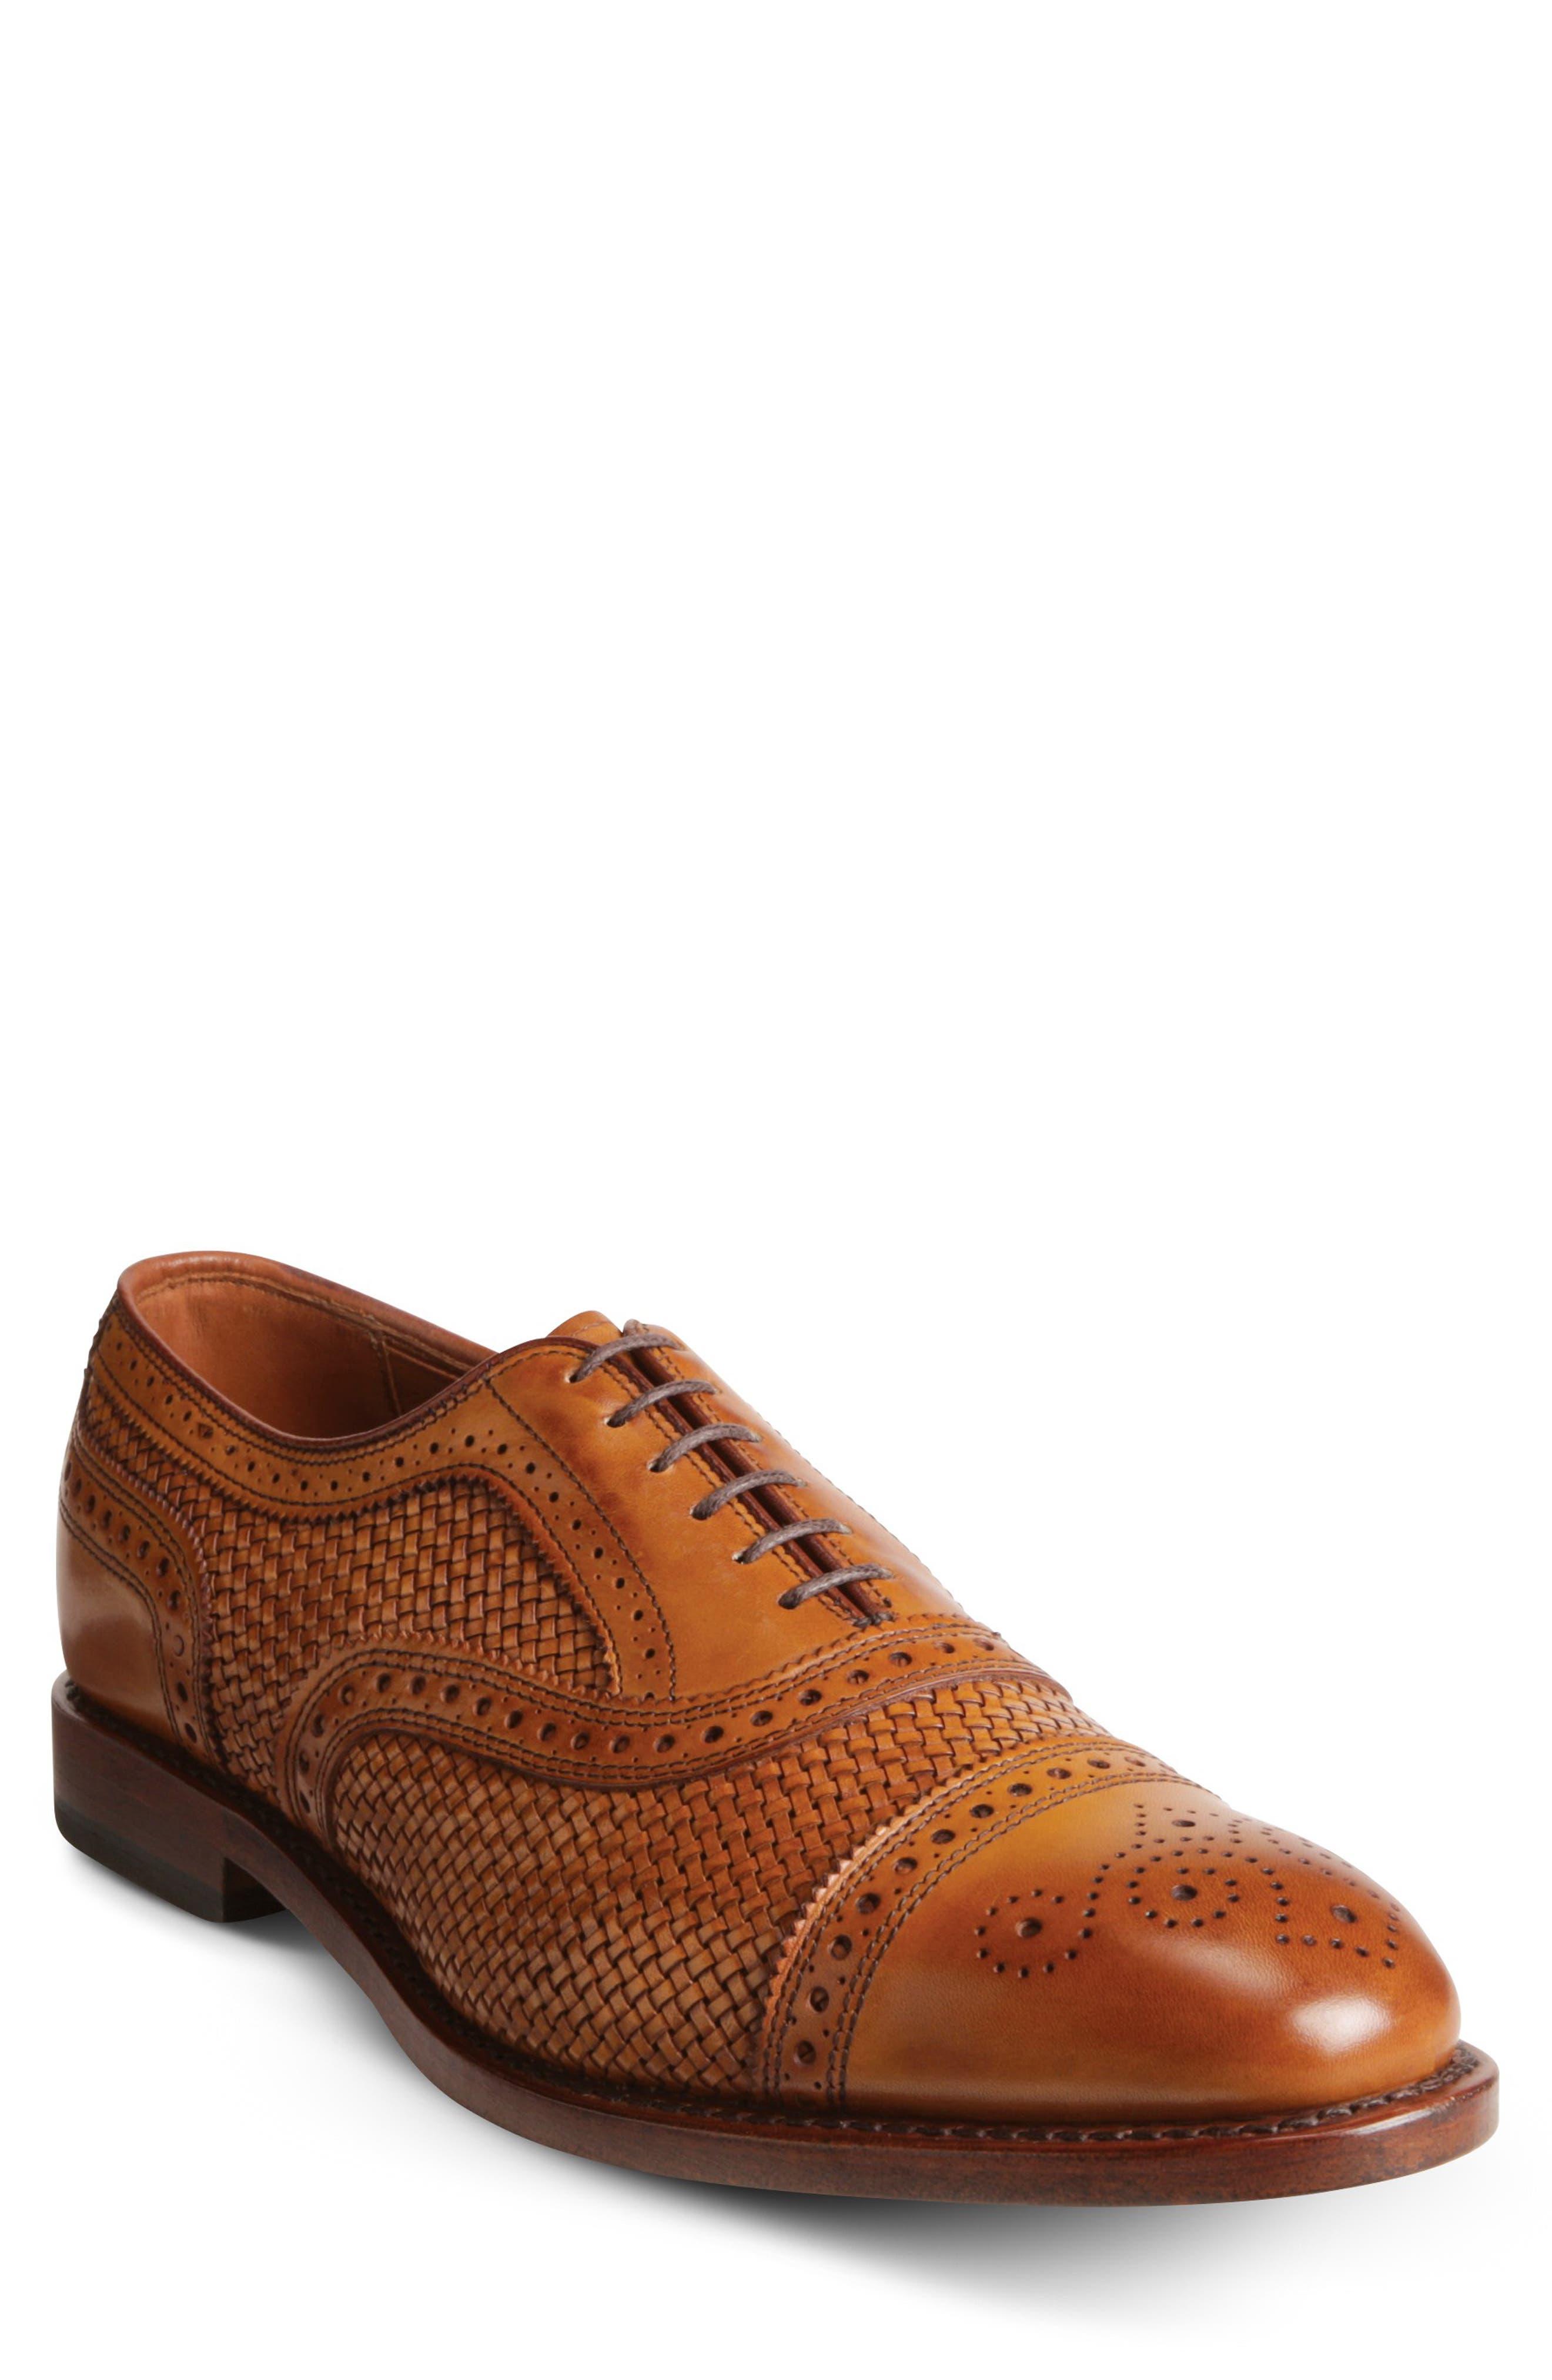 Strand Weave Toe Oxford